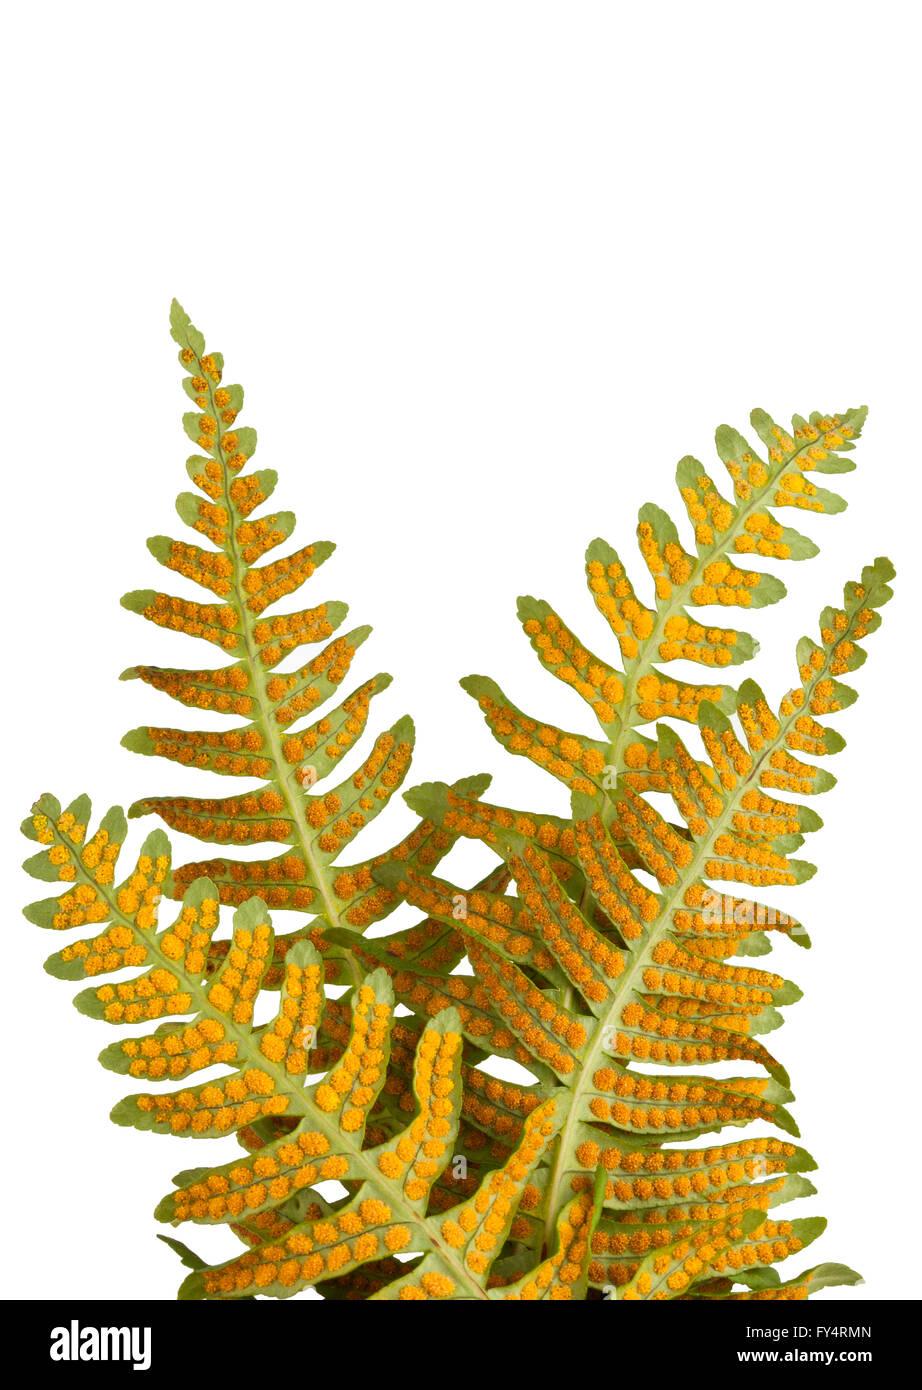 'Licorice Fern' 'Polypodium glycyrrhiza' Four fern leaves showing orange dots reproductive spores - Stock Image